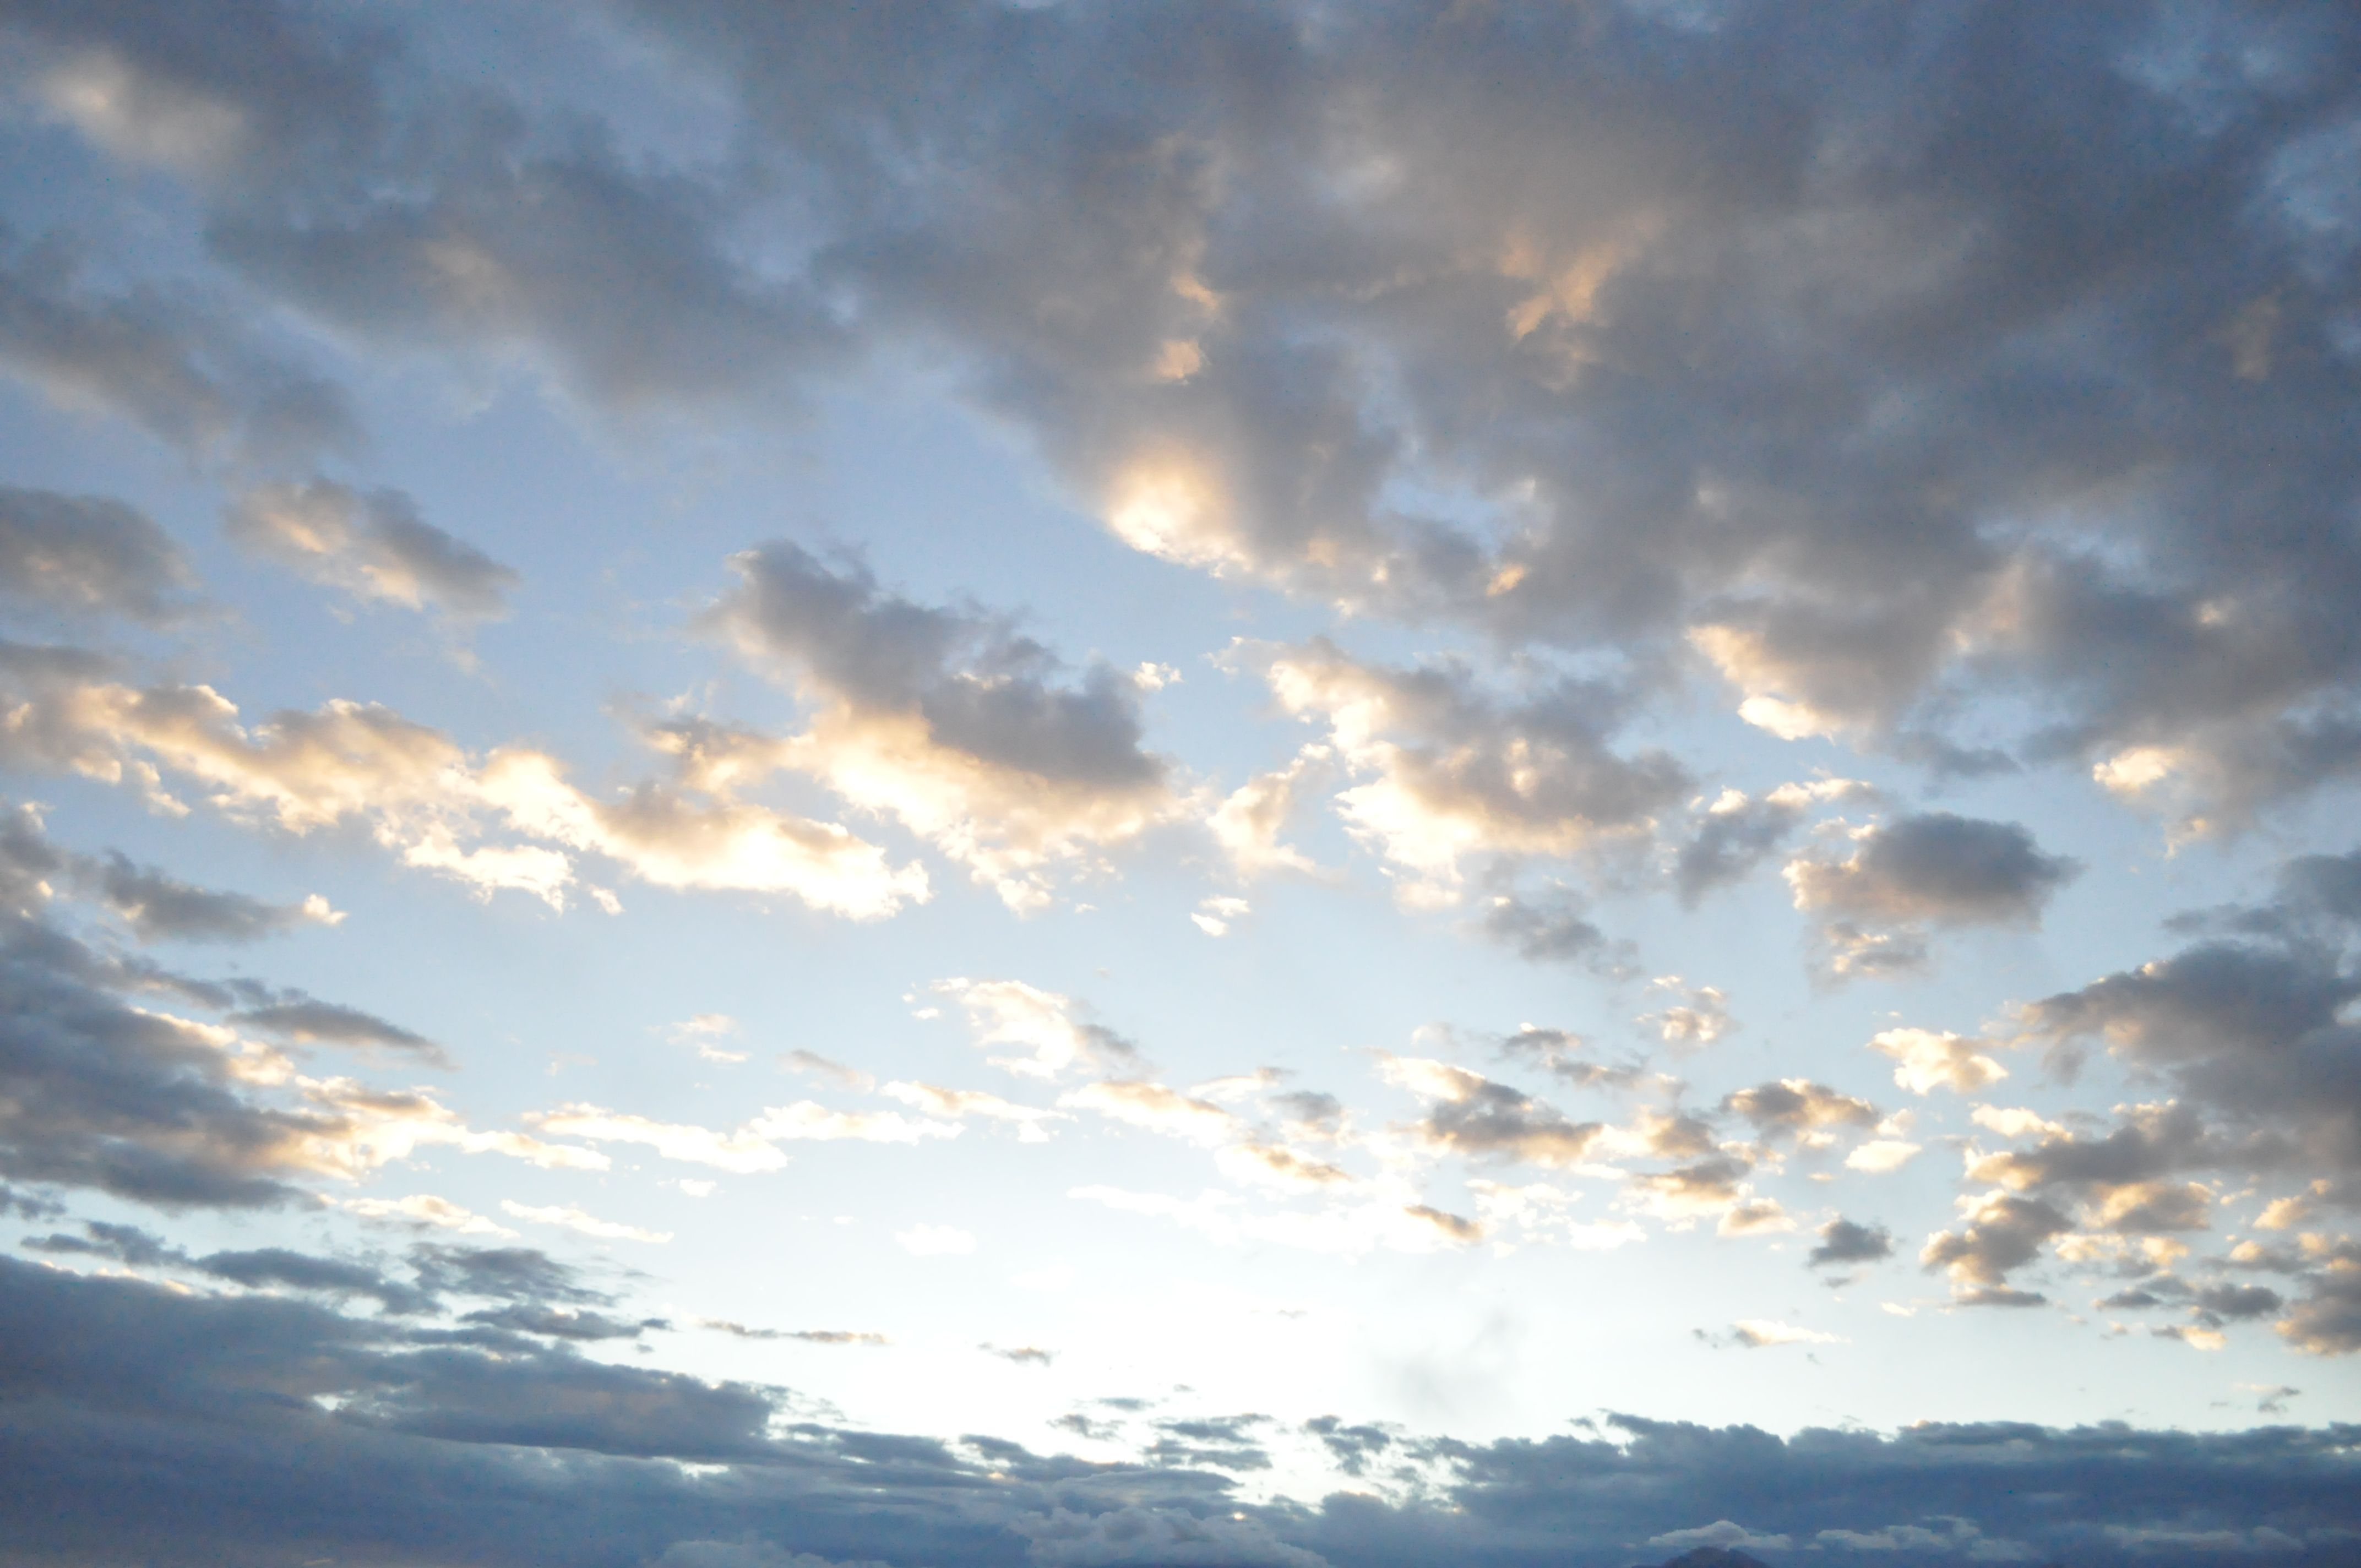 Sunrise Sky By Zerogroll Jpg 4288 2848 Sky Textures Sky Photoshop Computer Wallpaper